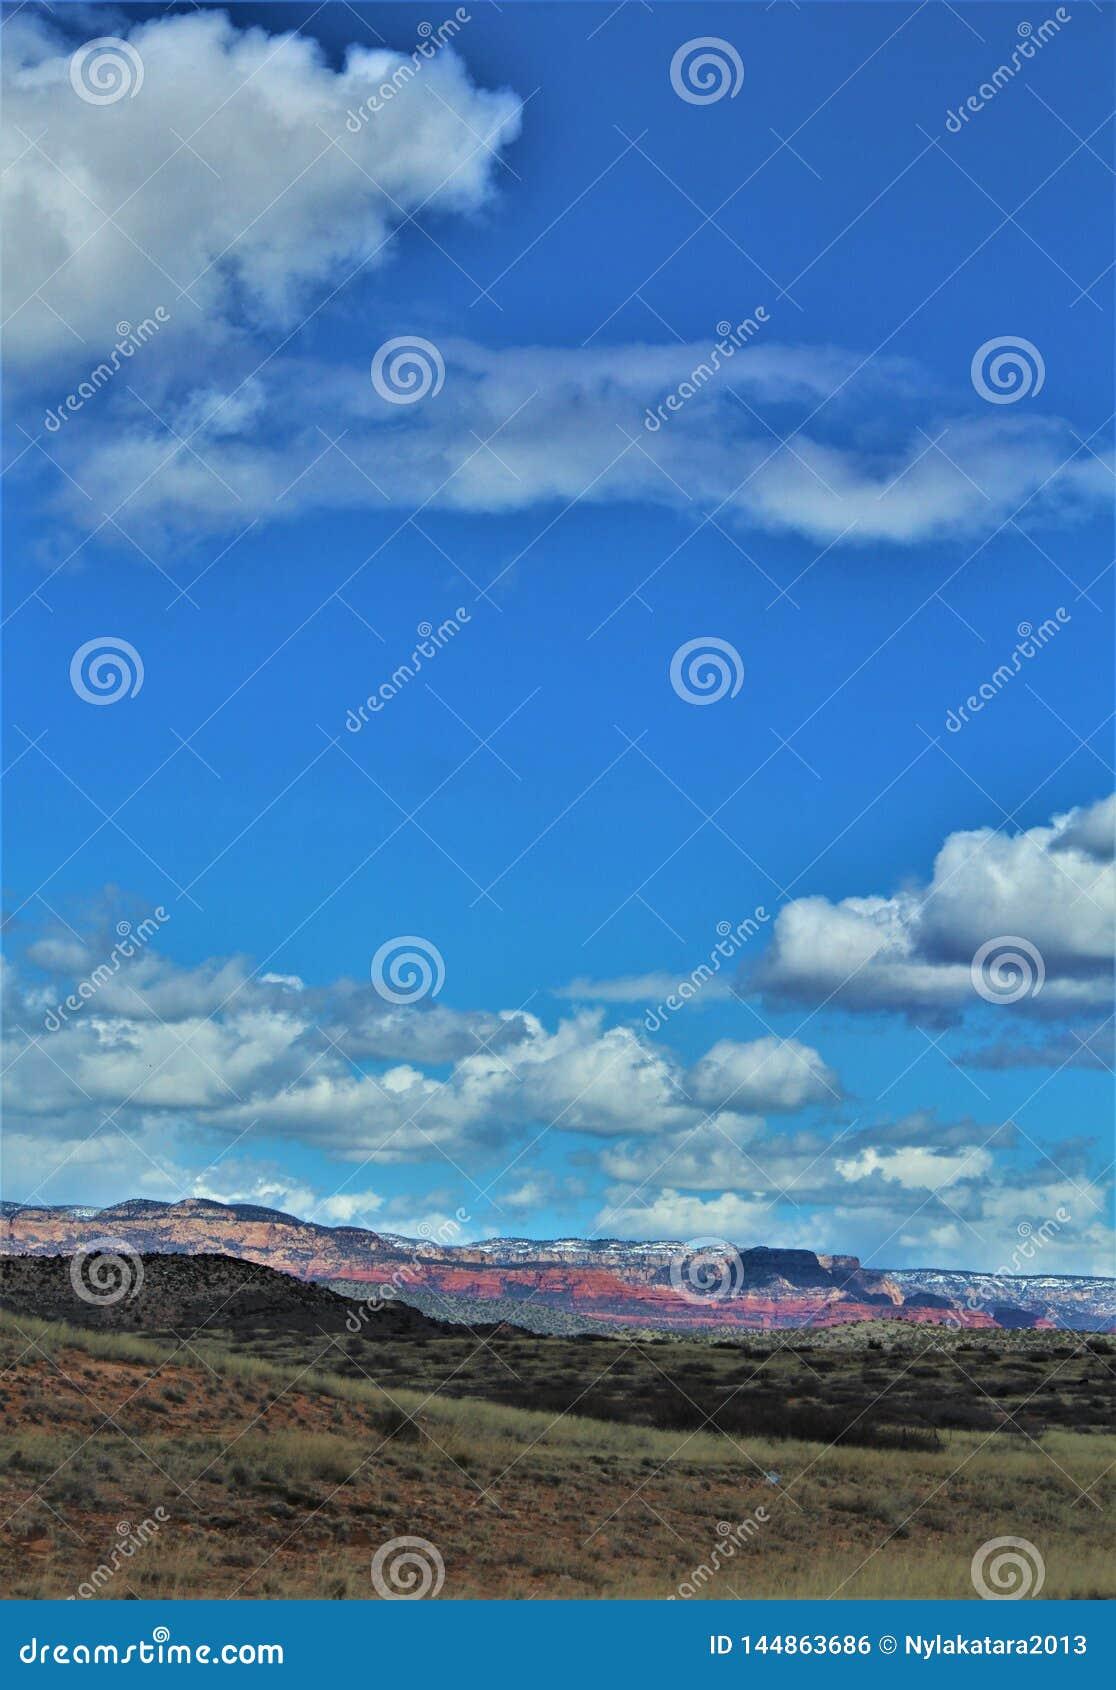 Phoenix To Flagstaff >> Landscape Scenery Interstate 17 Phoenix To Flagstaff Arizona